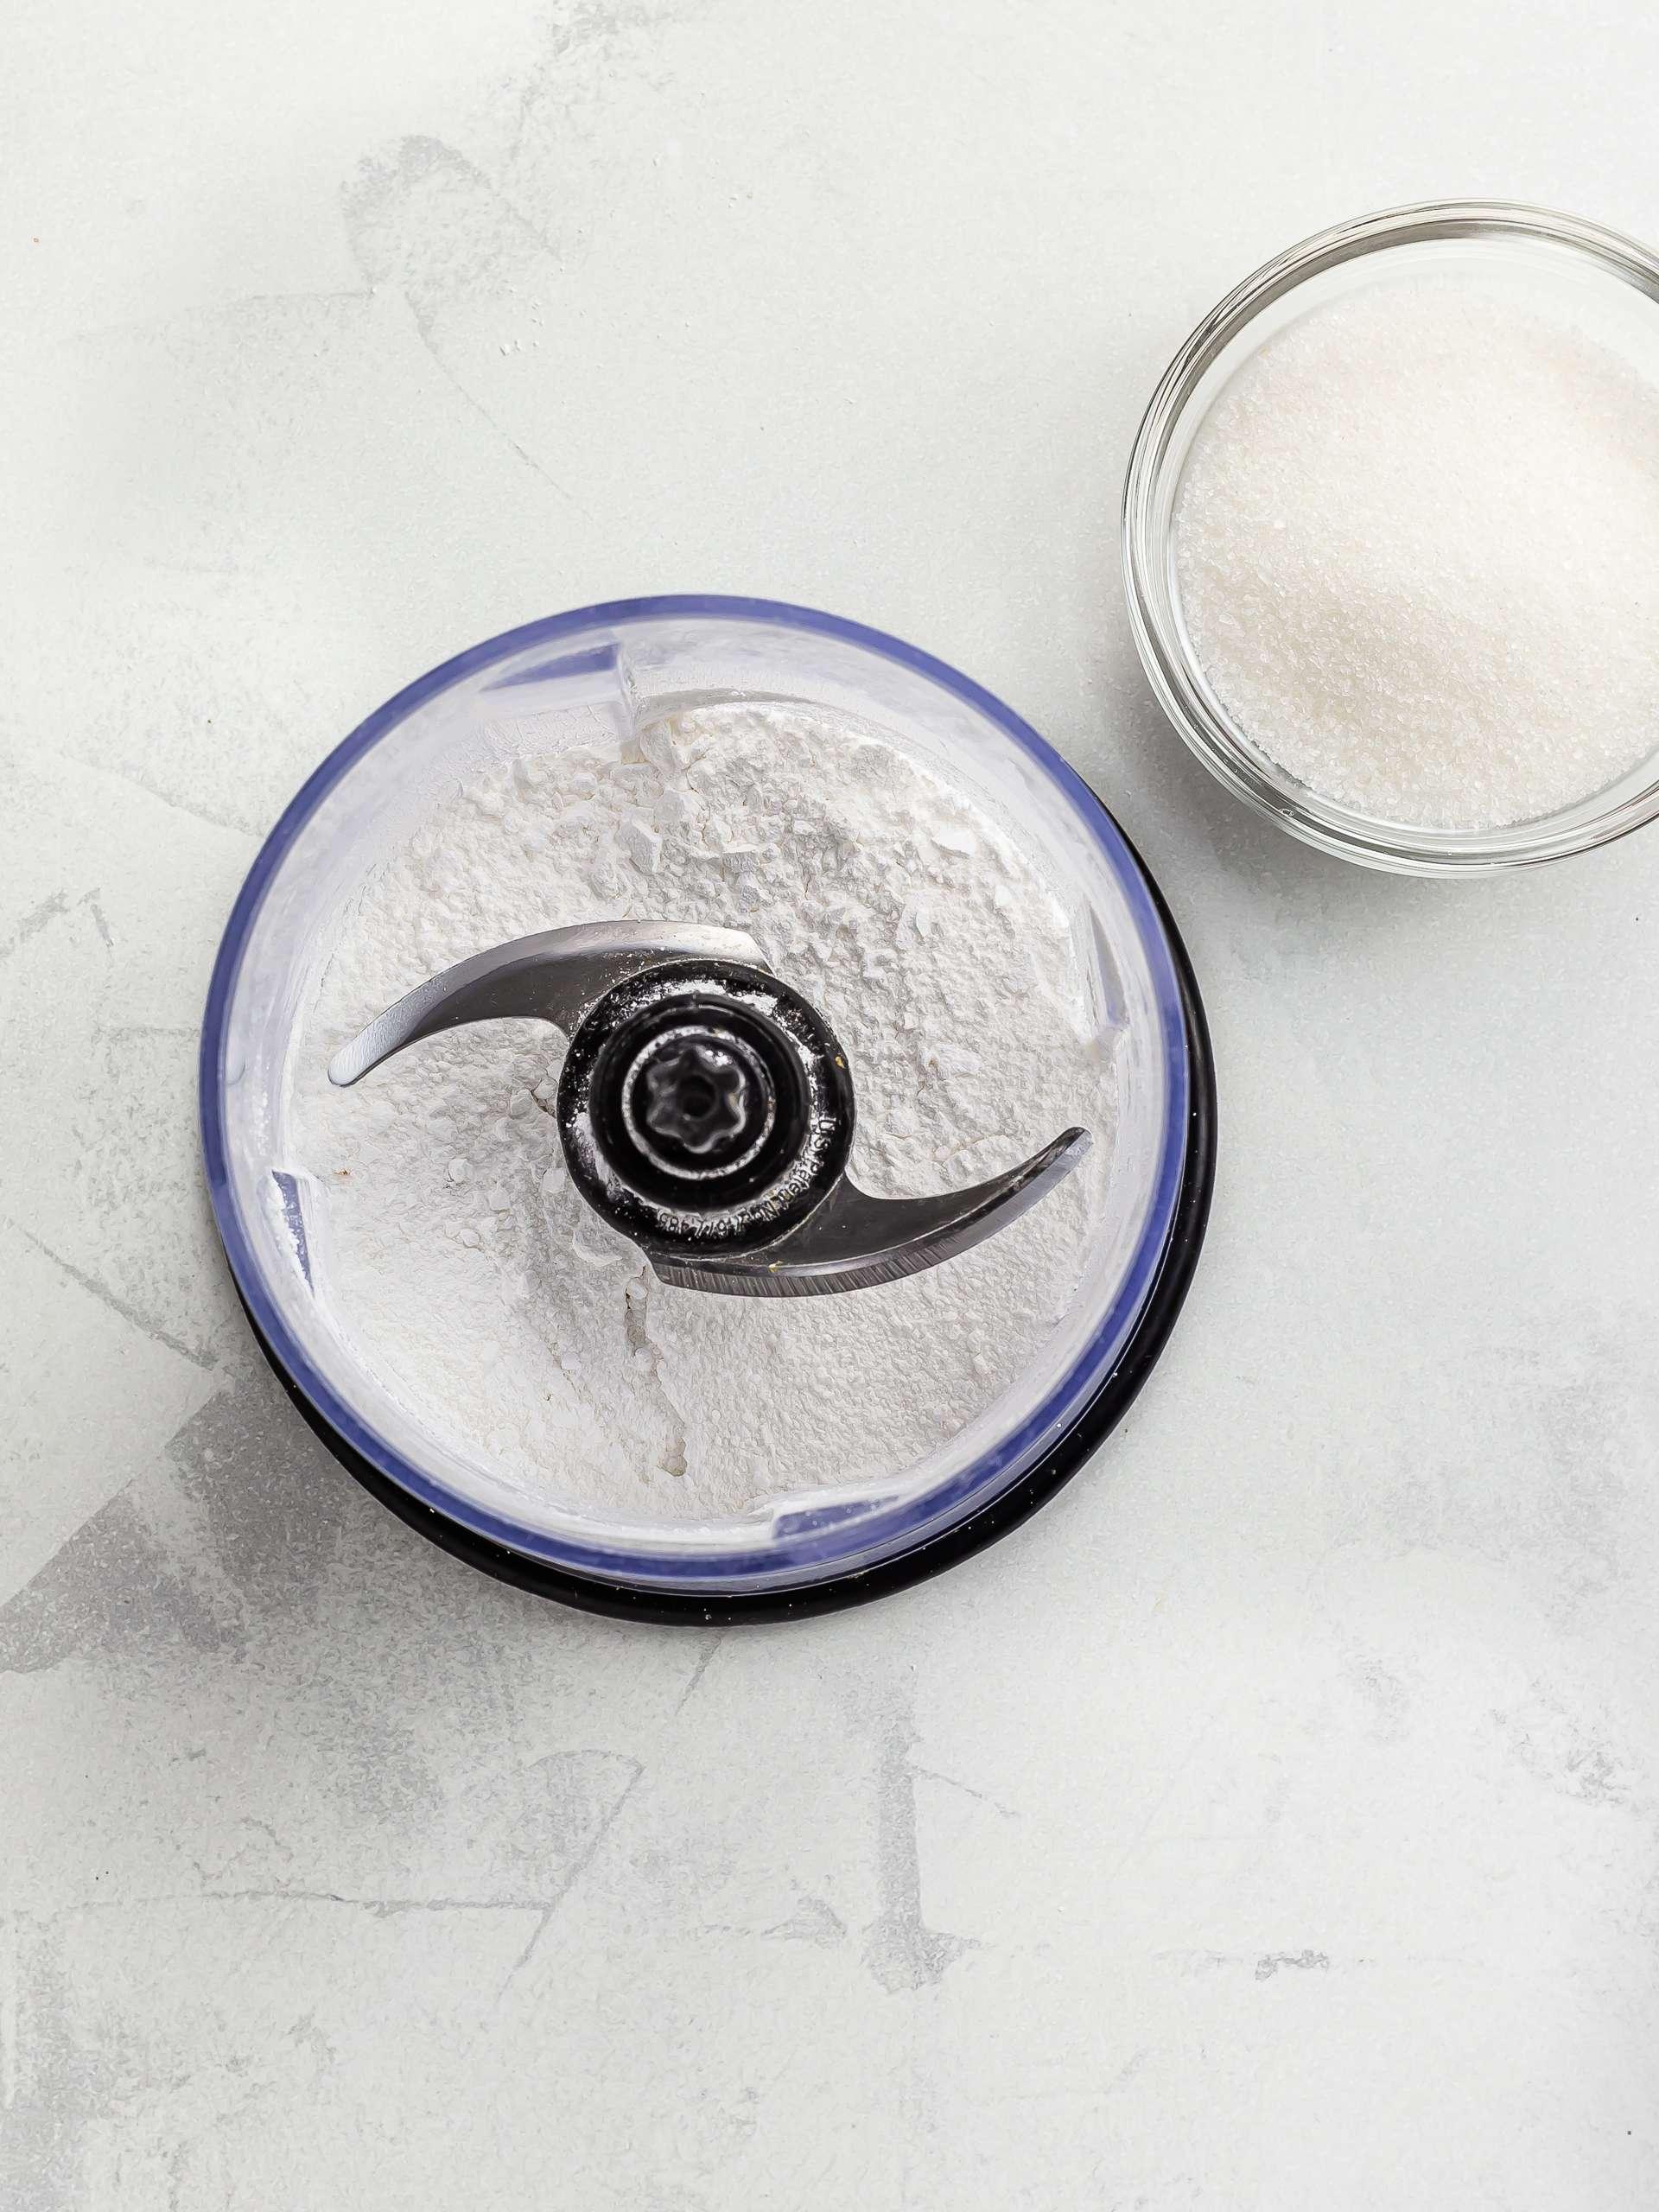 powdered erythritol in a blender